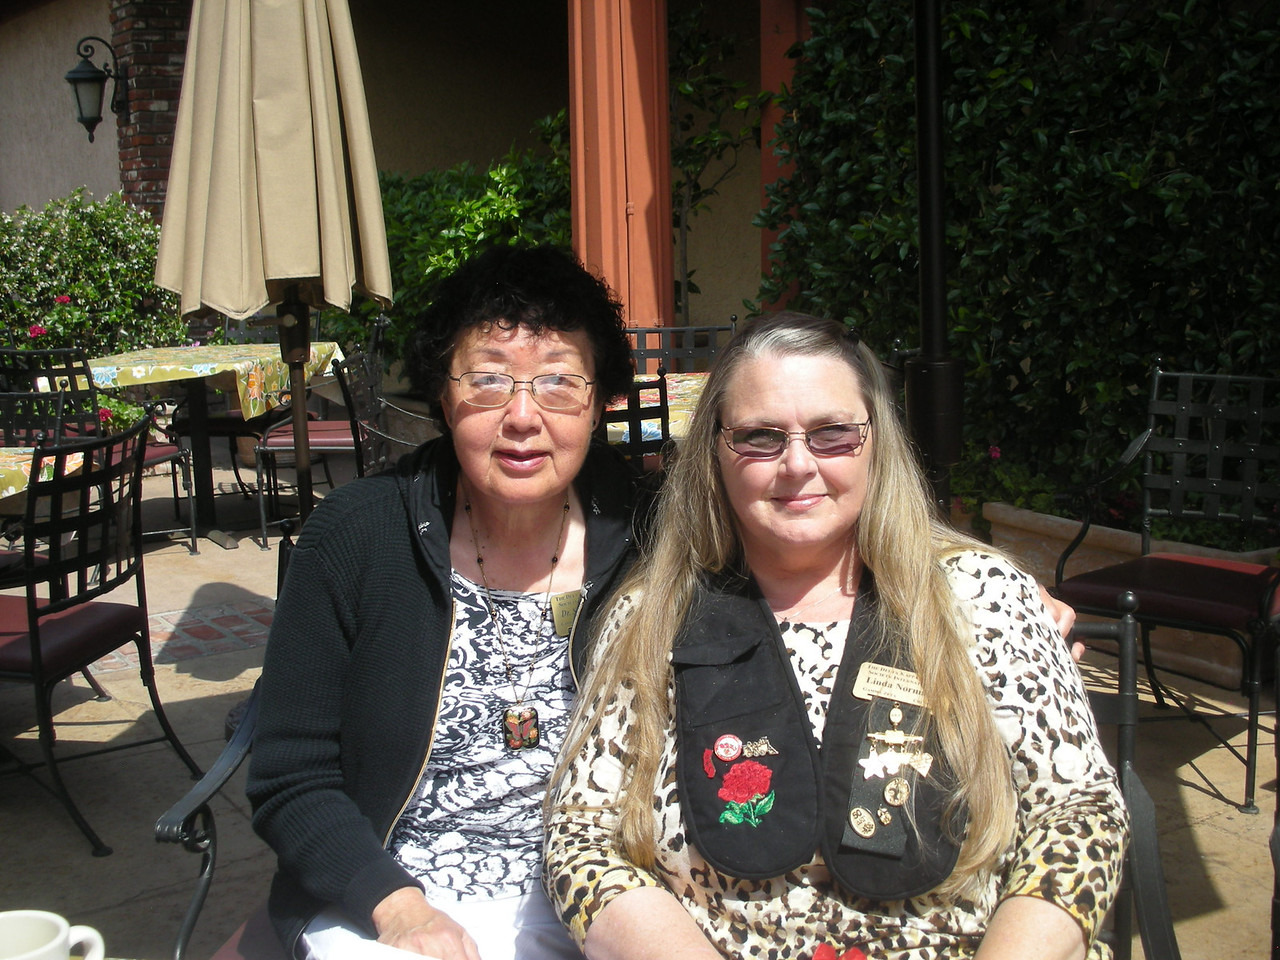 Sumie Imada and Linda Norman at Hoff's Hut June Breakfast